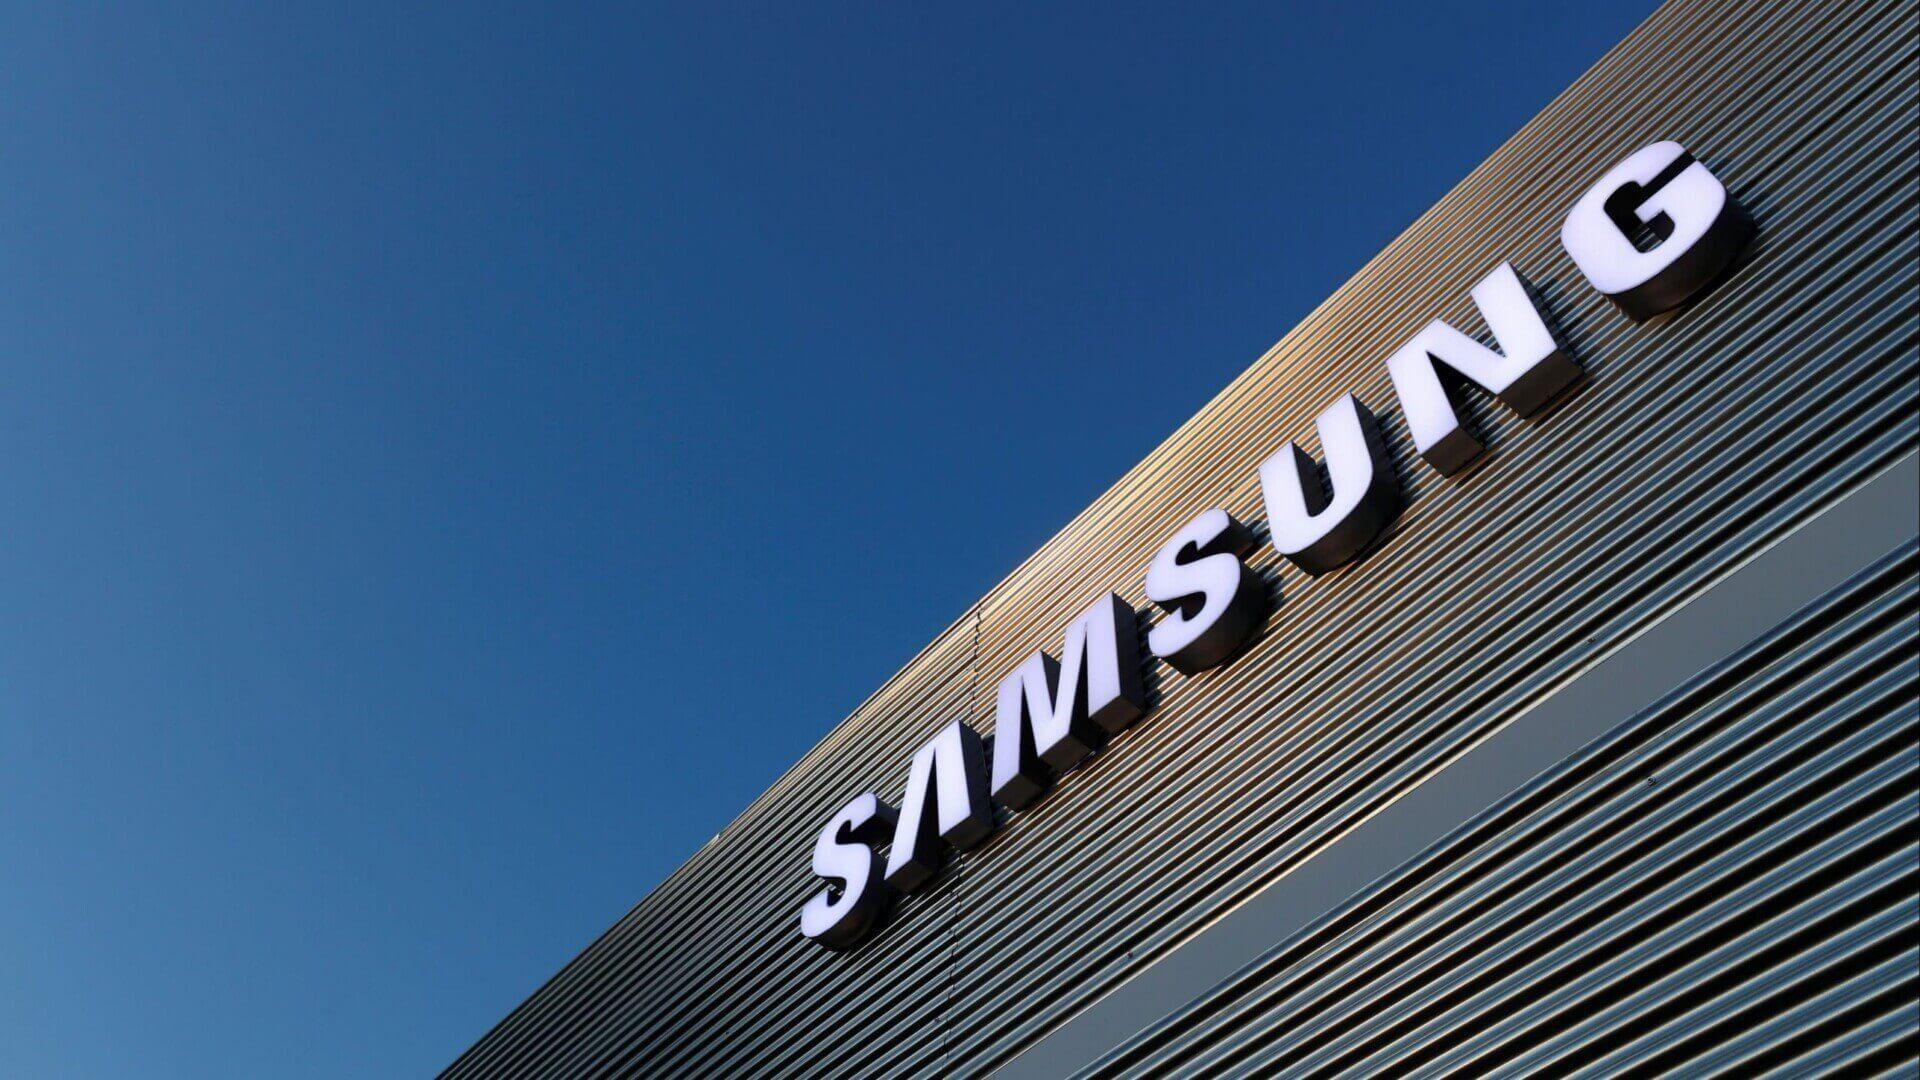 SuperSonic Radio - SuperSonic Radio - Samsung, cel mai mare producător mondial de smartphone